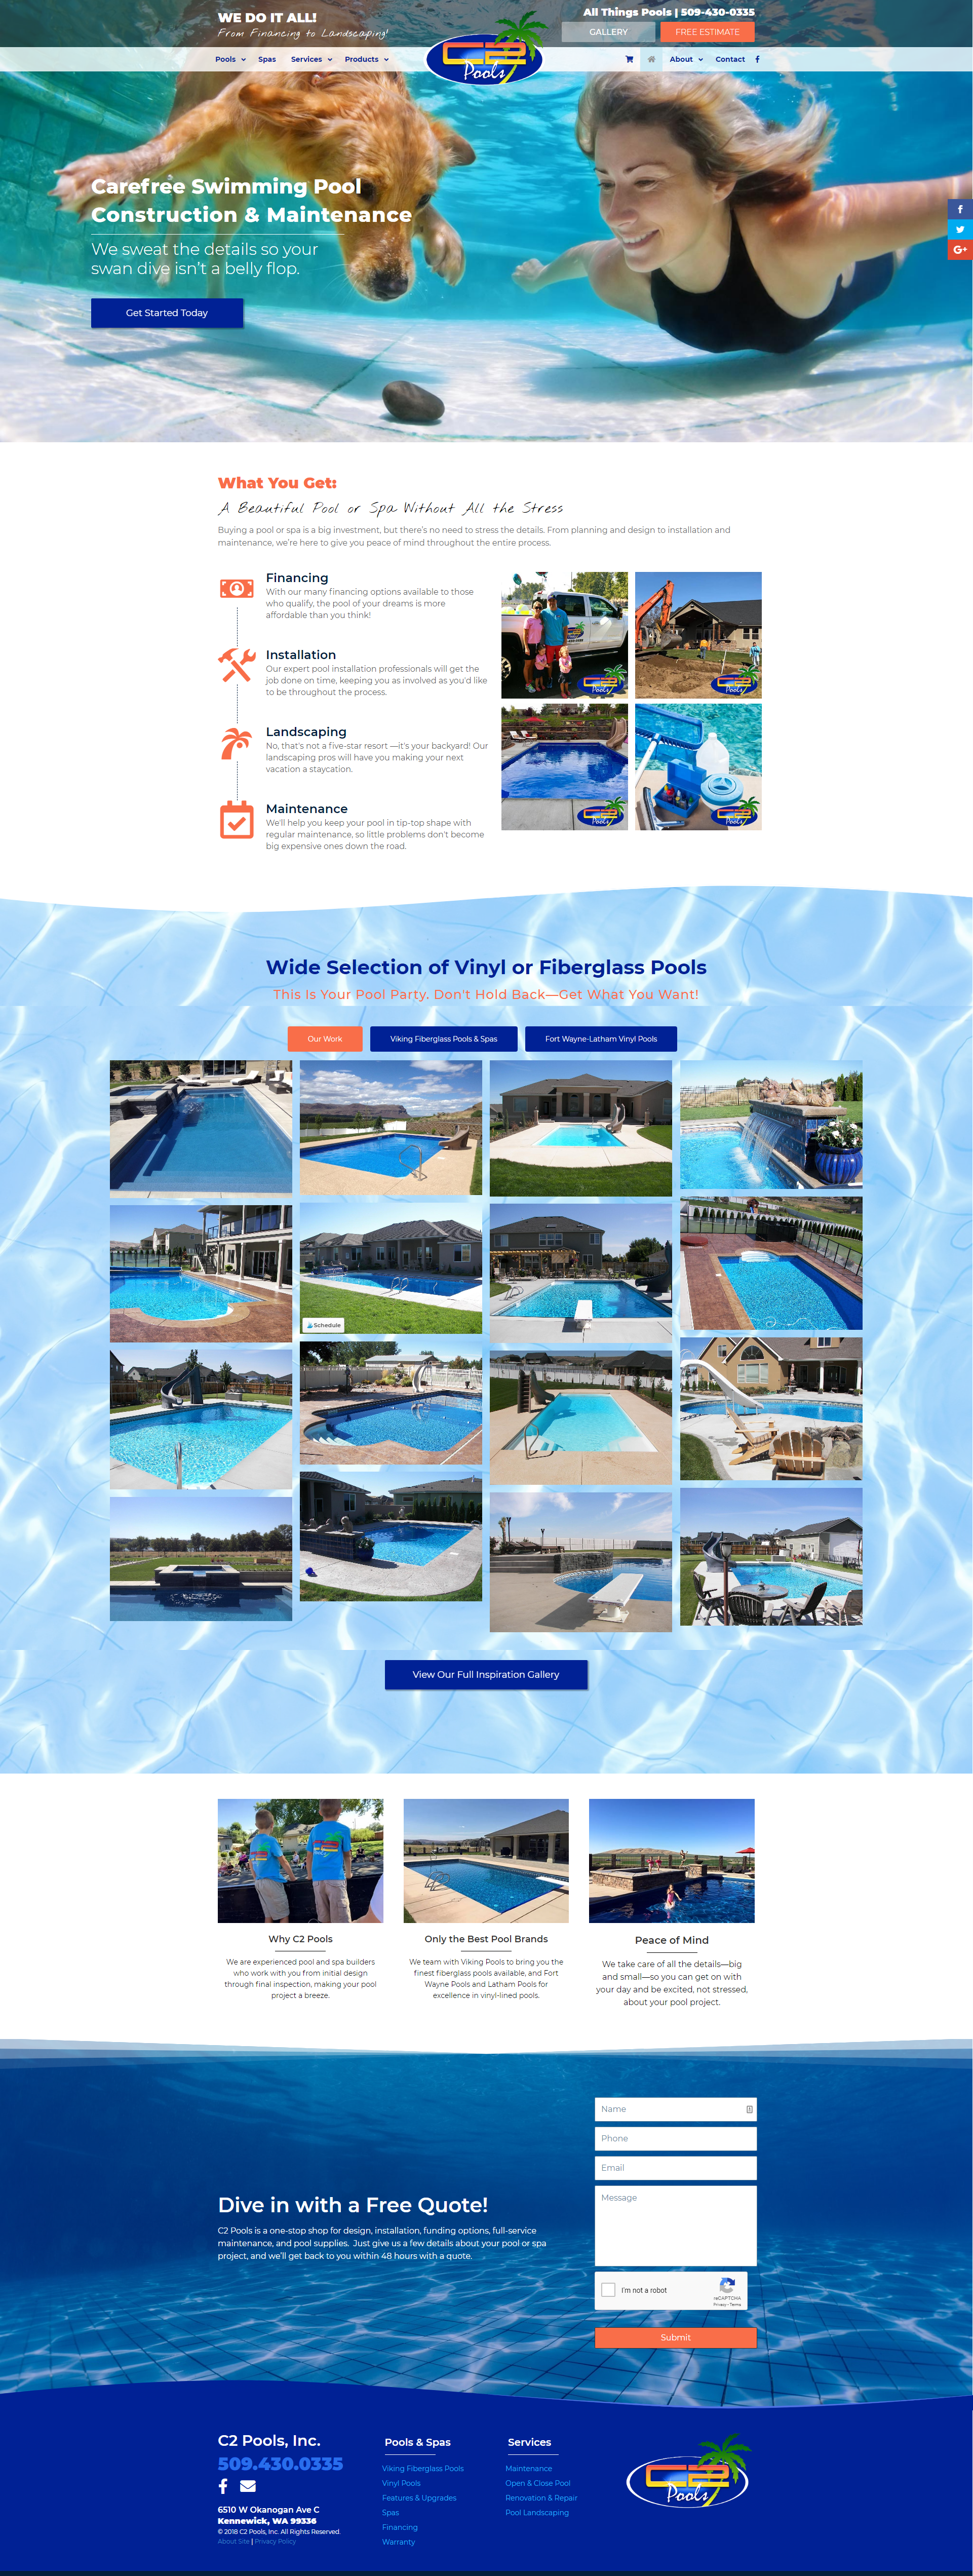 Construction Pools Website Design In 2020 Digital Marketing Design Portfolio Web Design Marketing Design